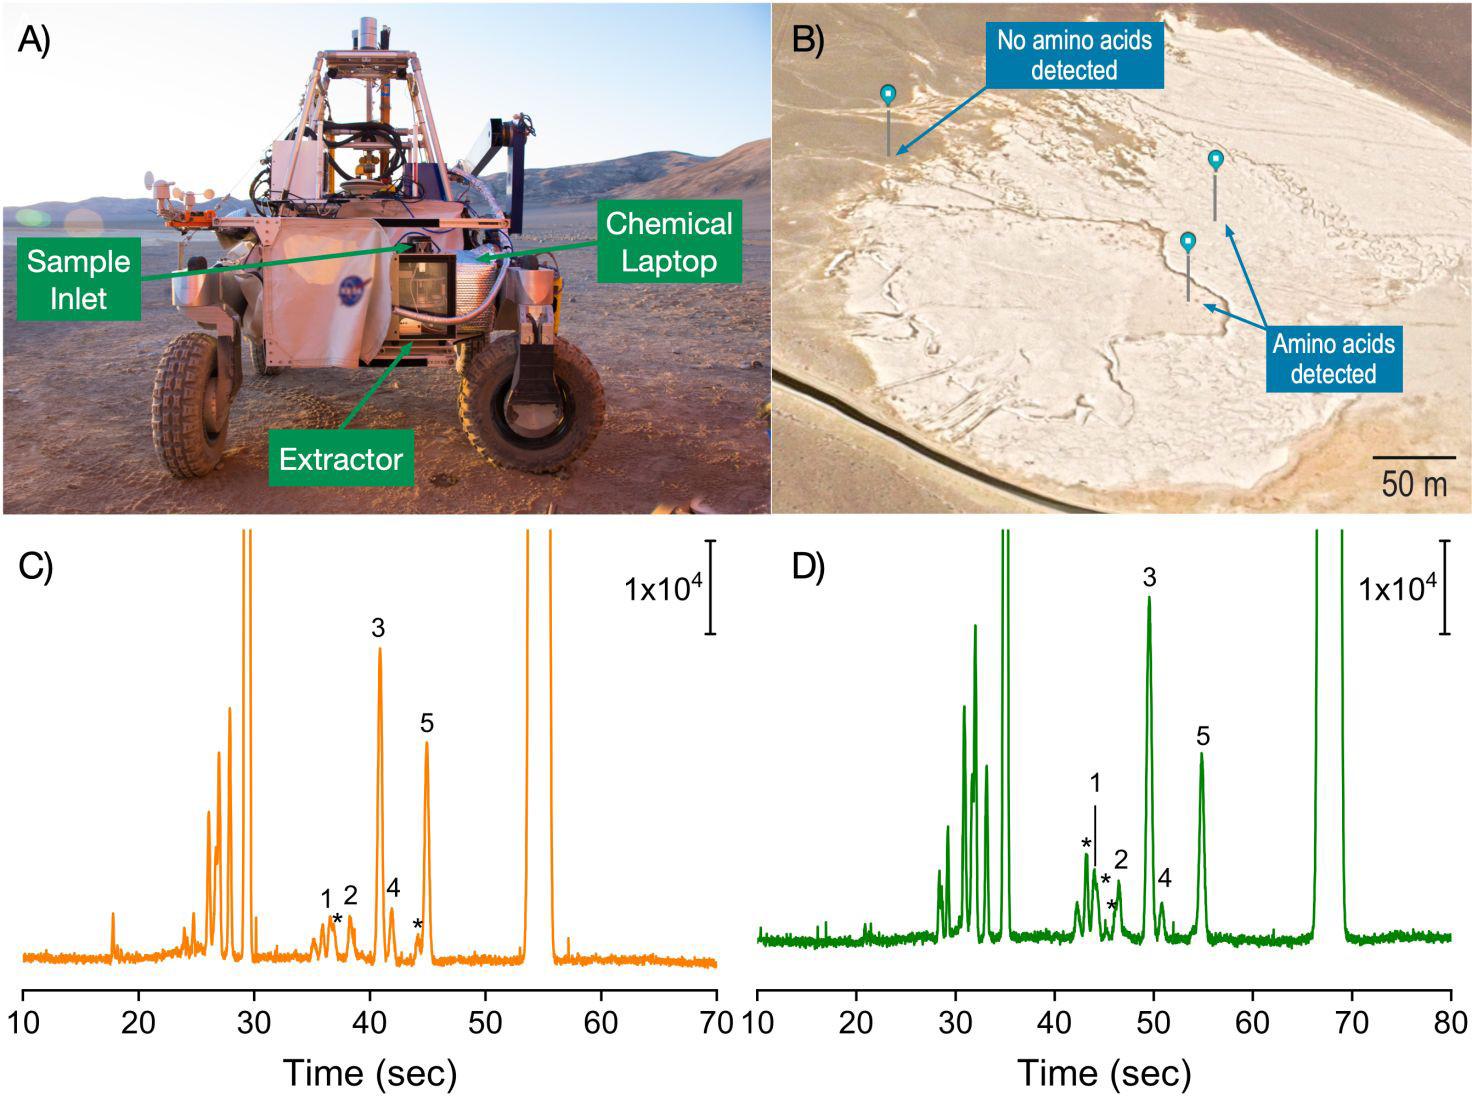 Chemical Laptop field experiment in Atacama desert